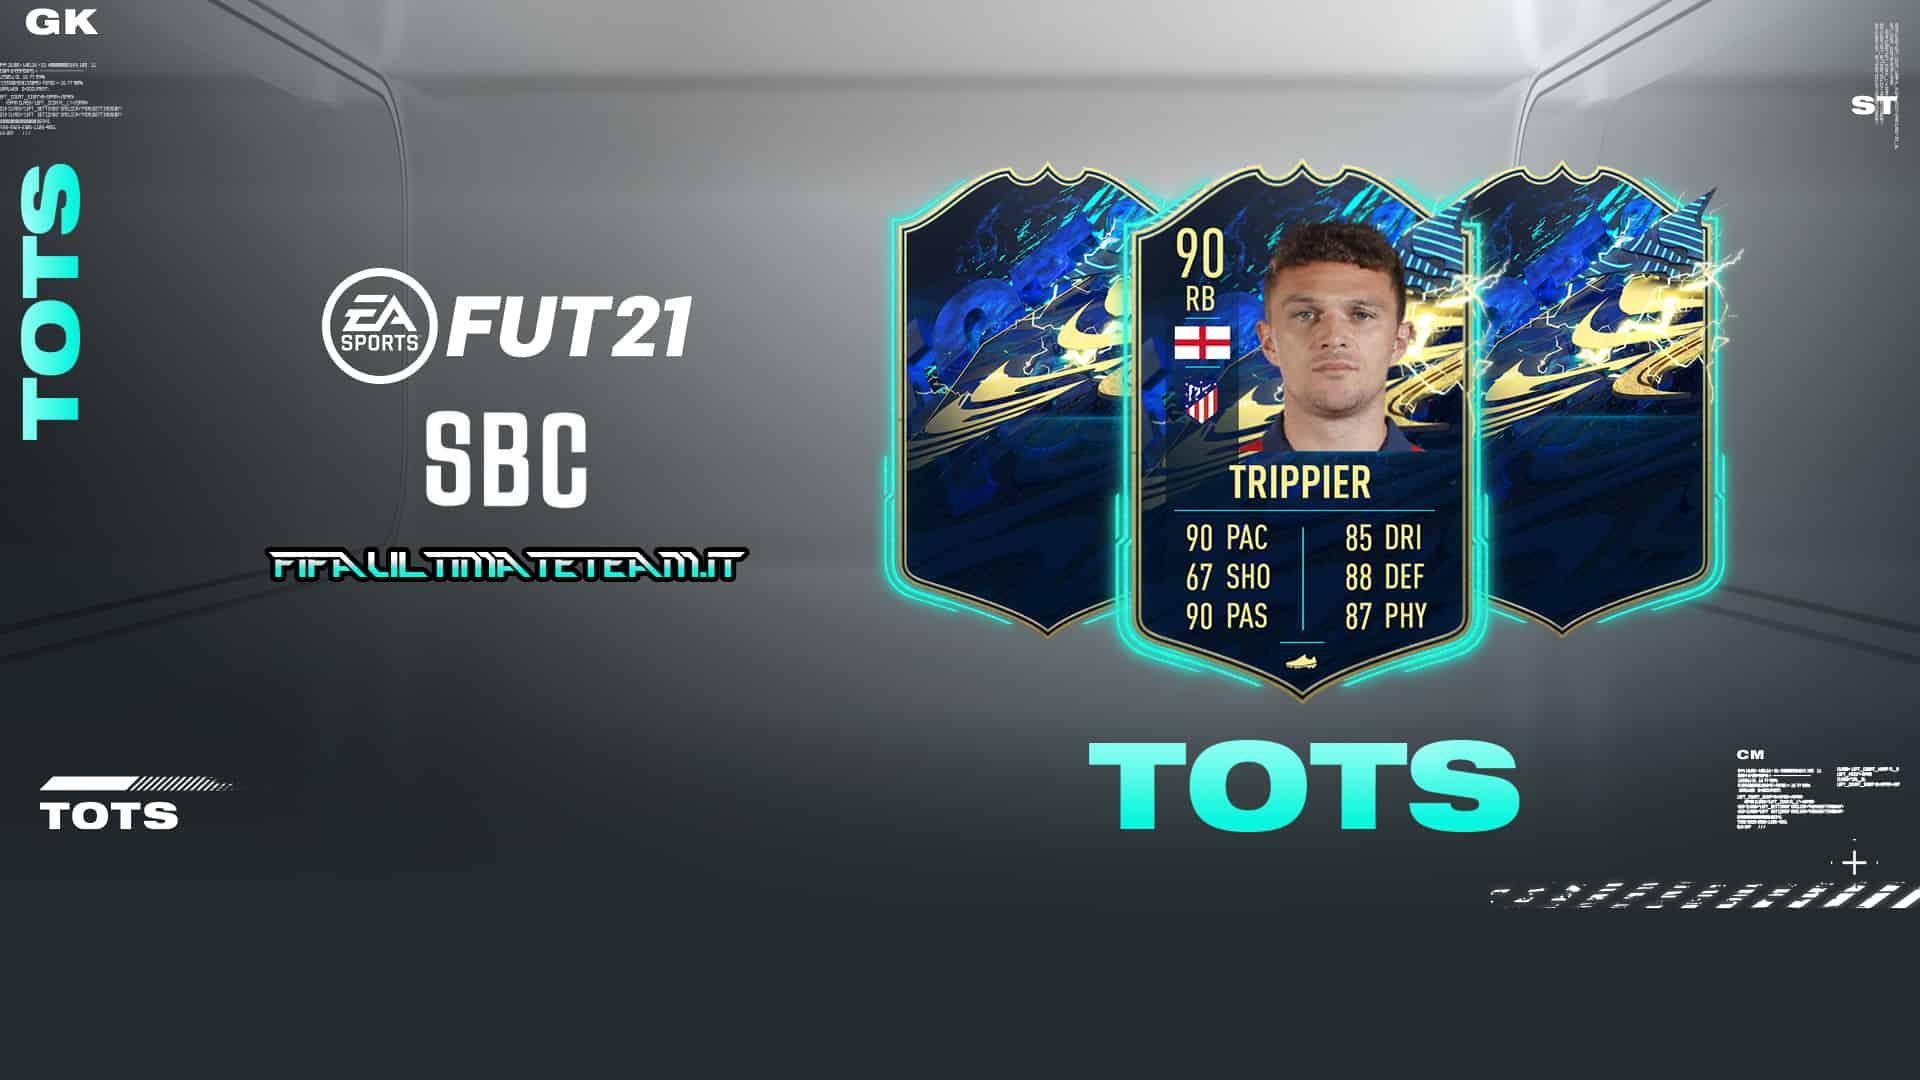 TOTS Trippier de FIFA 21